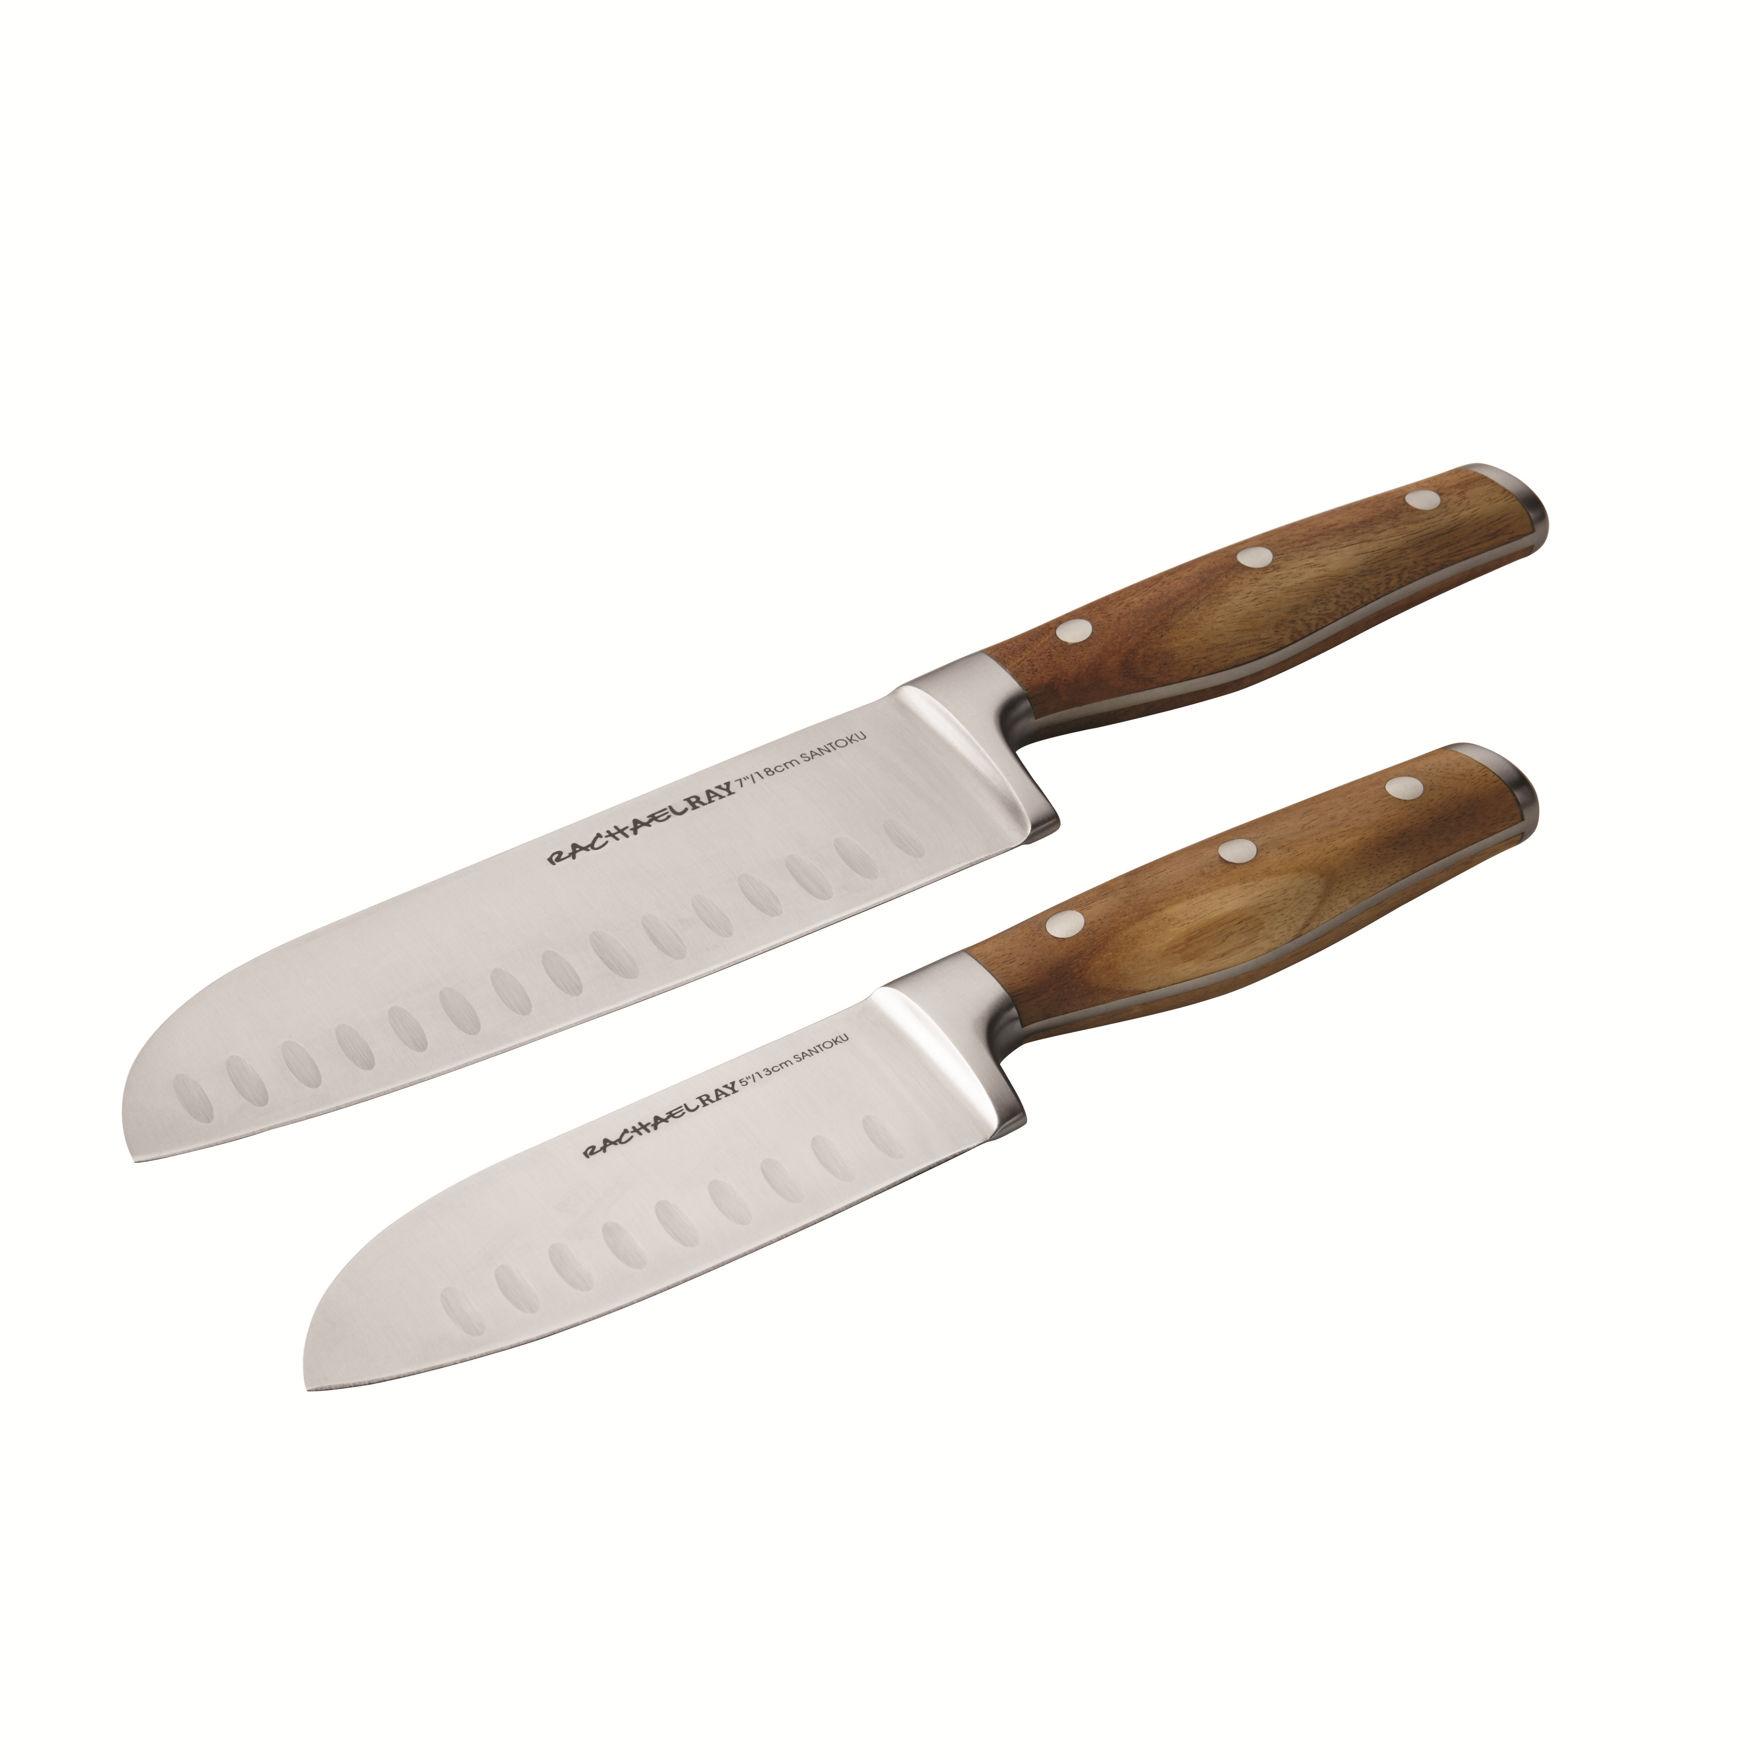 Rachael Ray Wood Knives & Cutlery